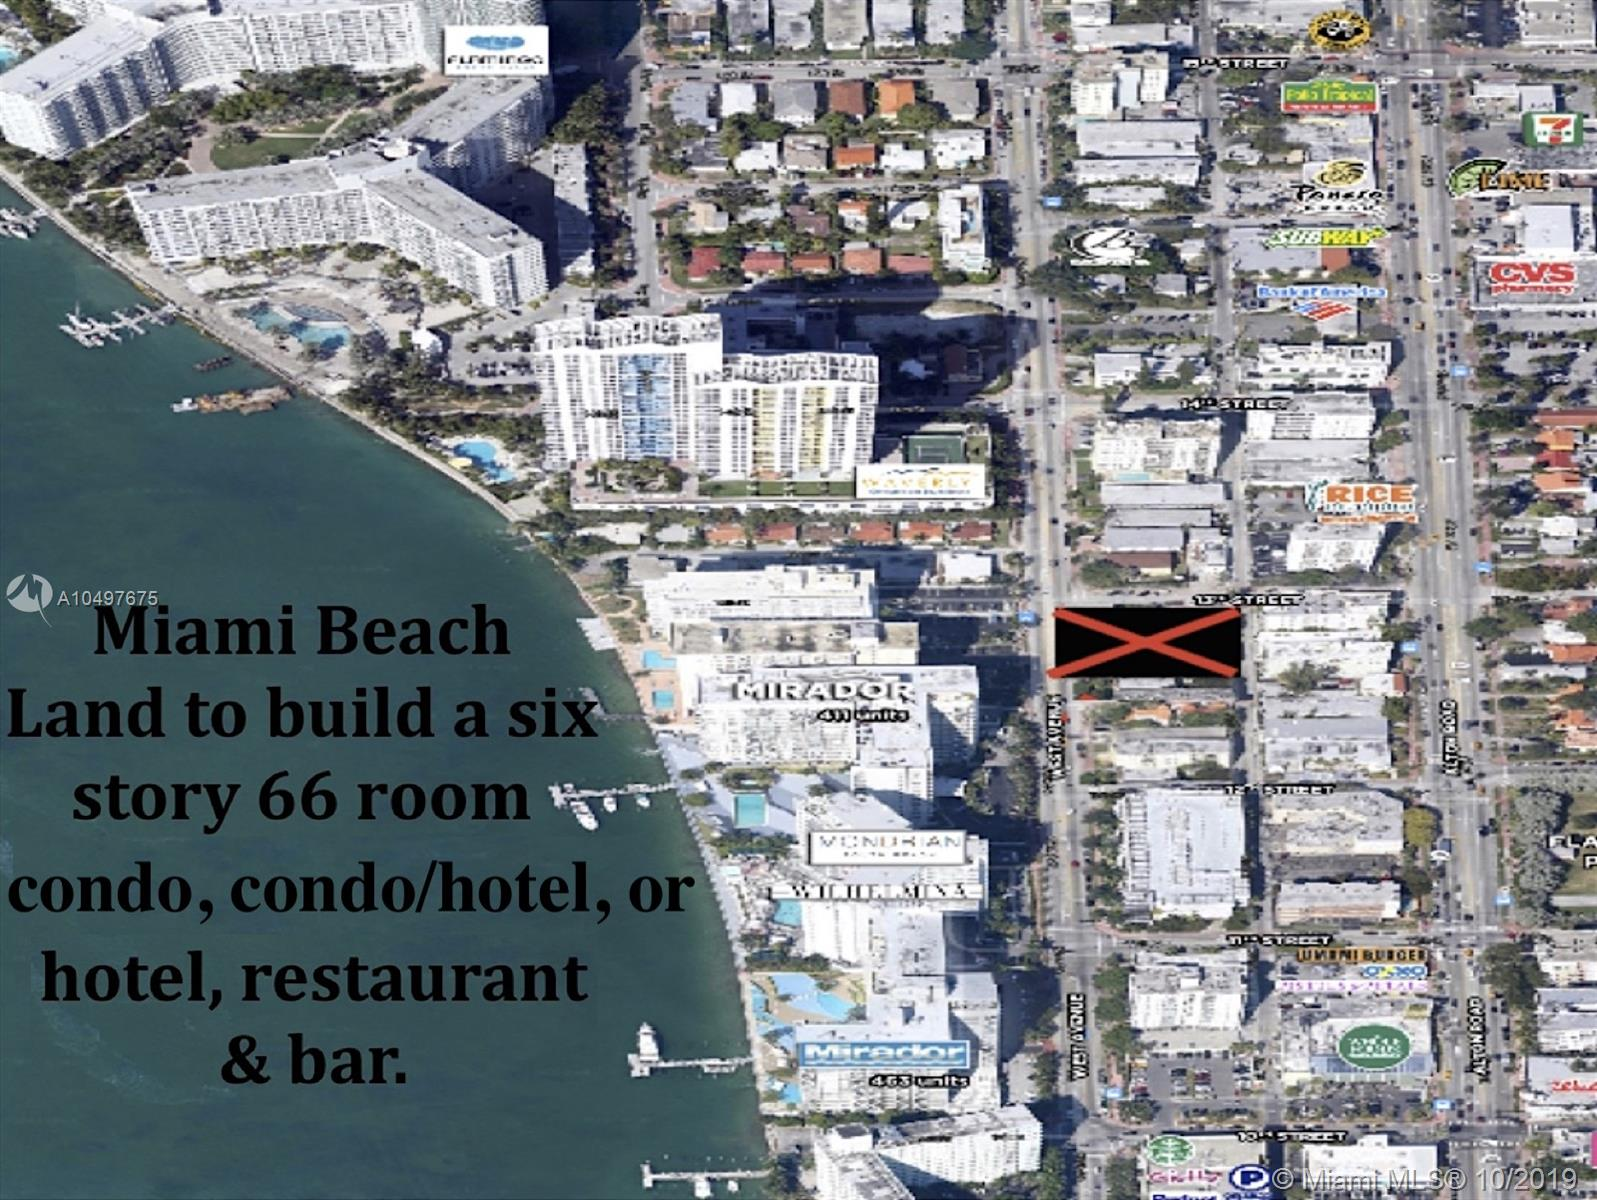 1255 West Av Miami Beach, FL - Image 0